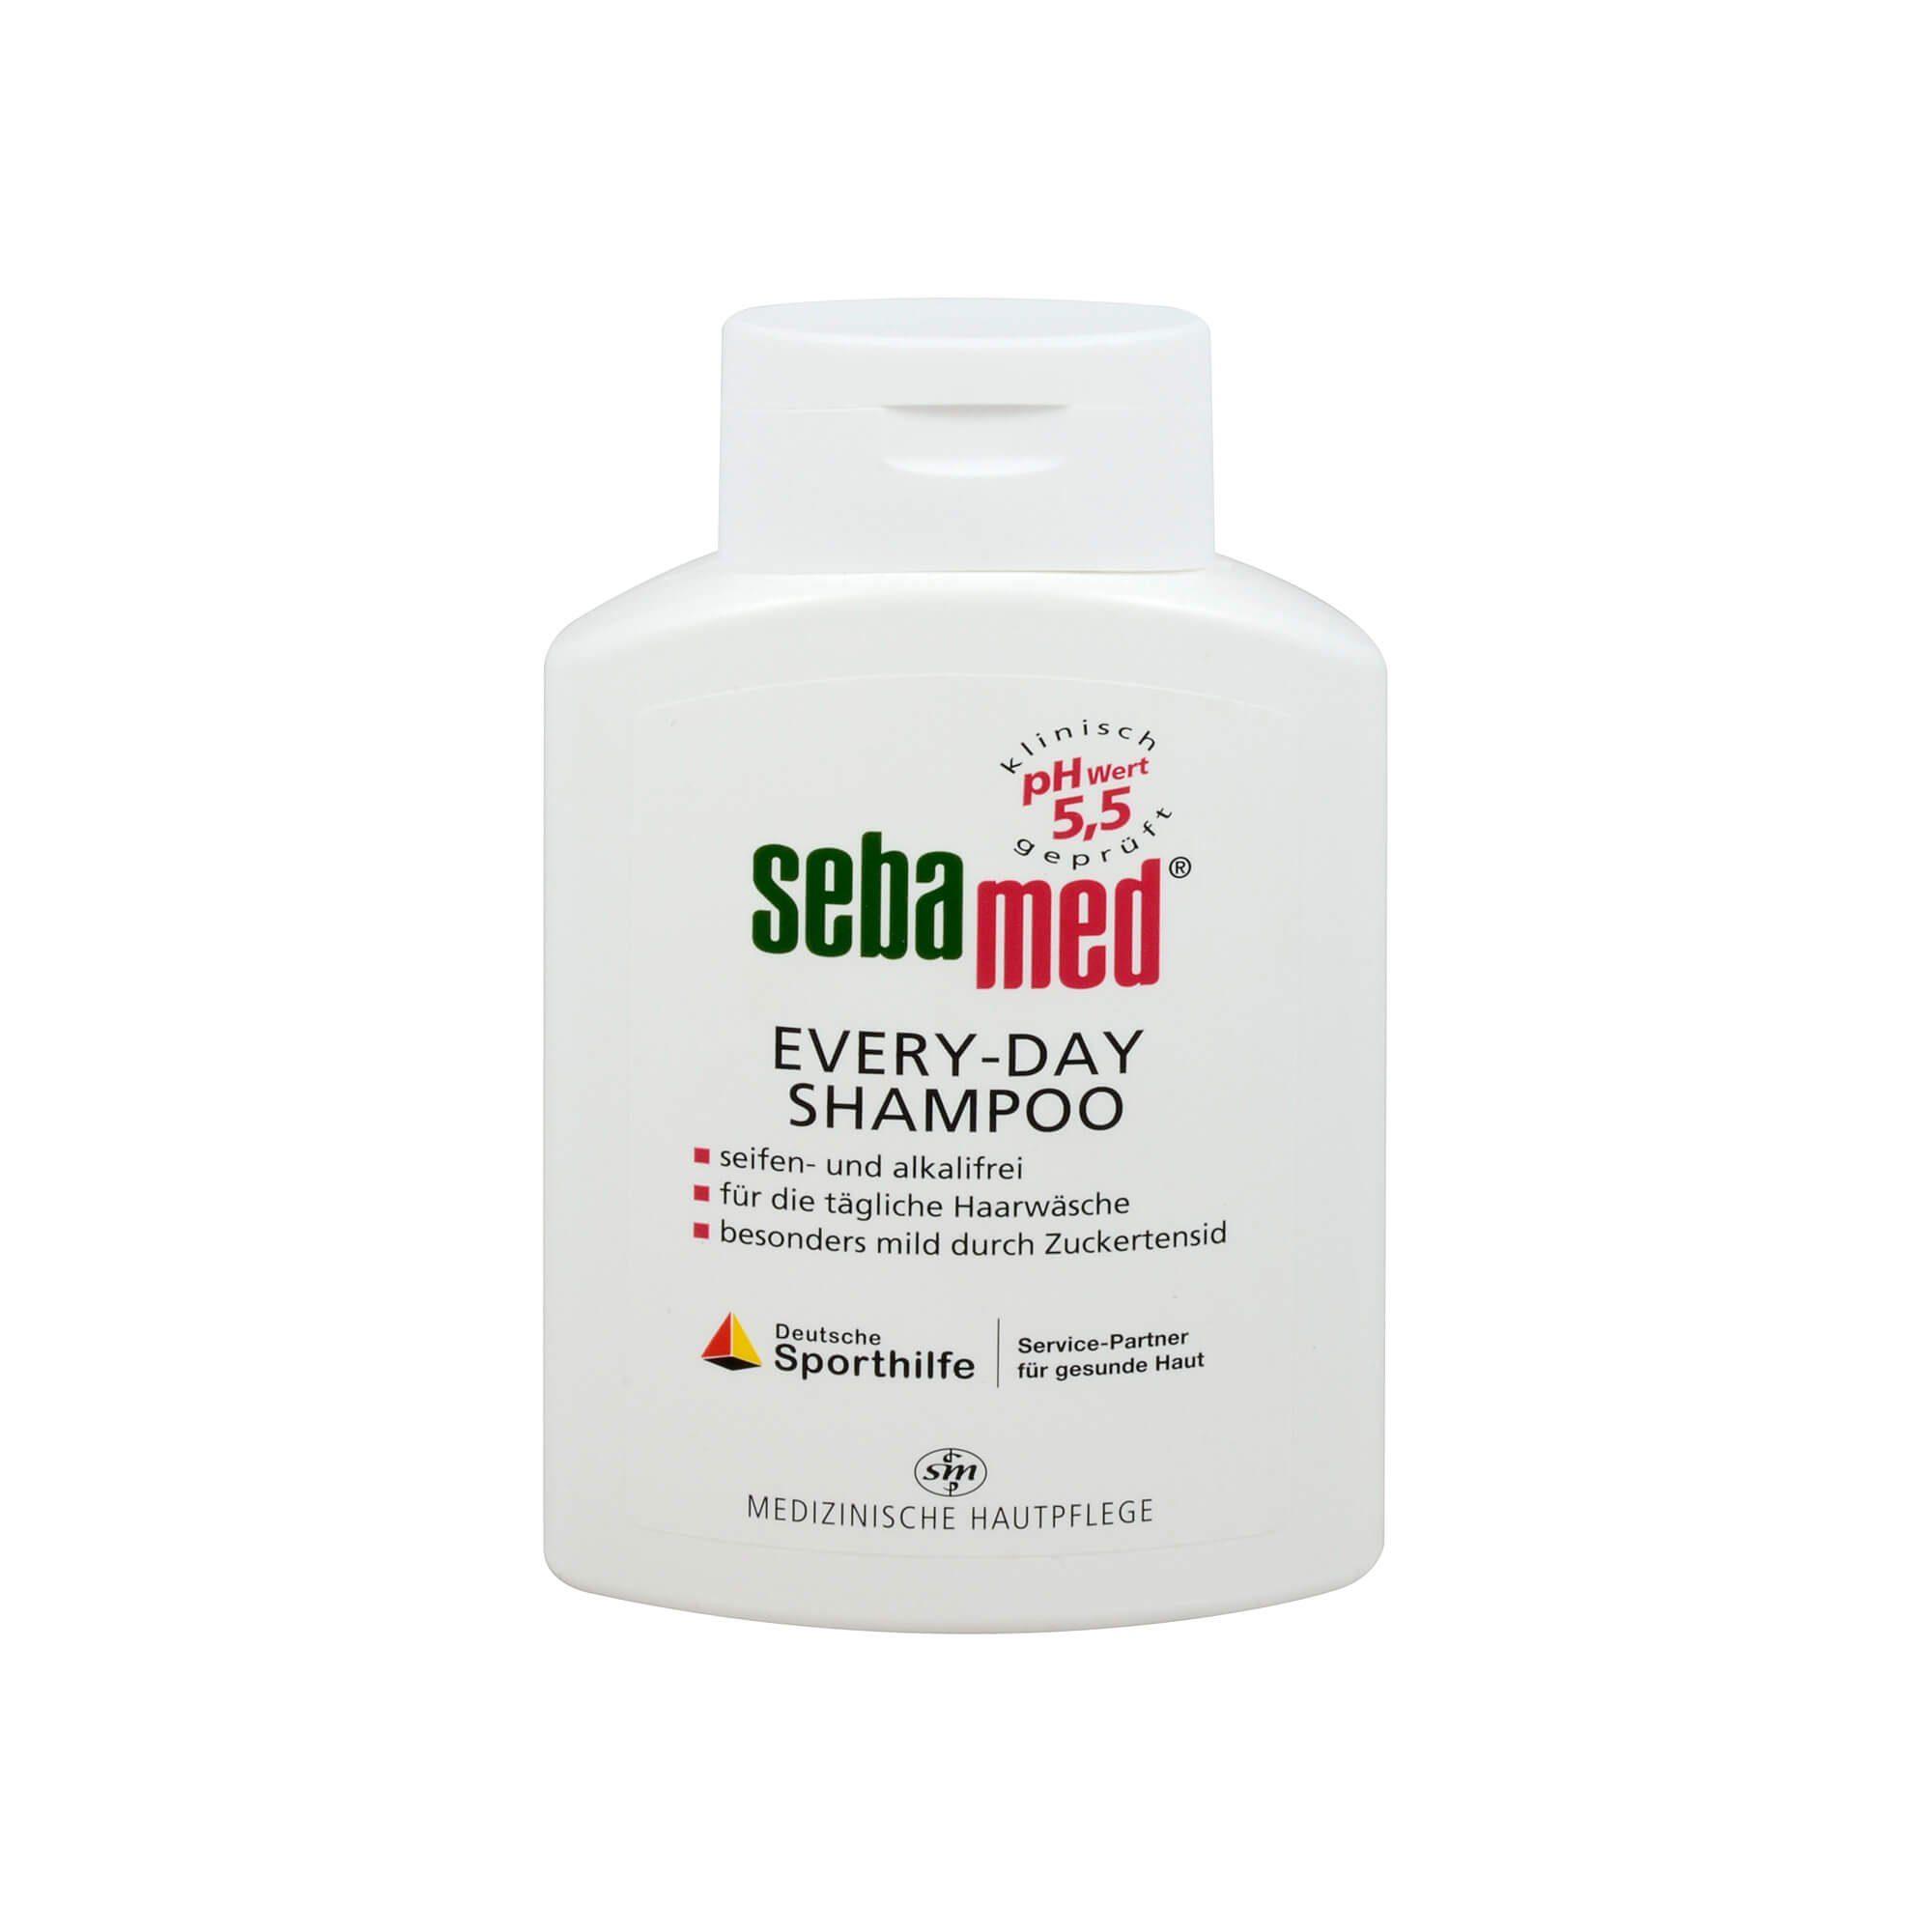 Sebamed Every-Day Shampoo, 200 ml